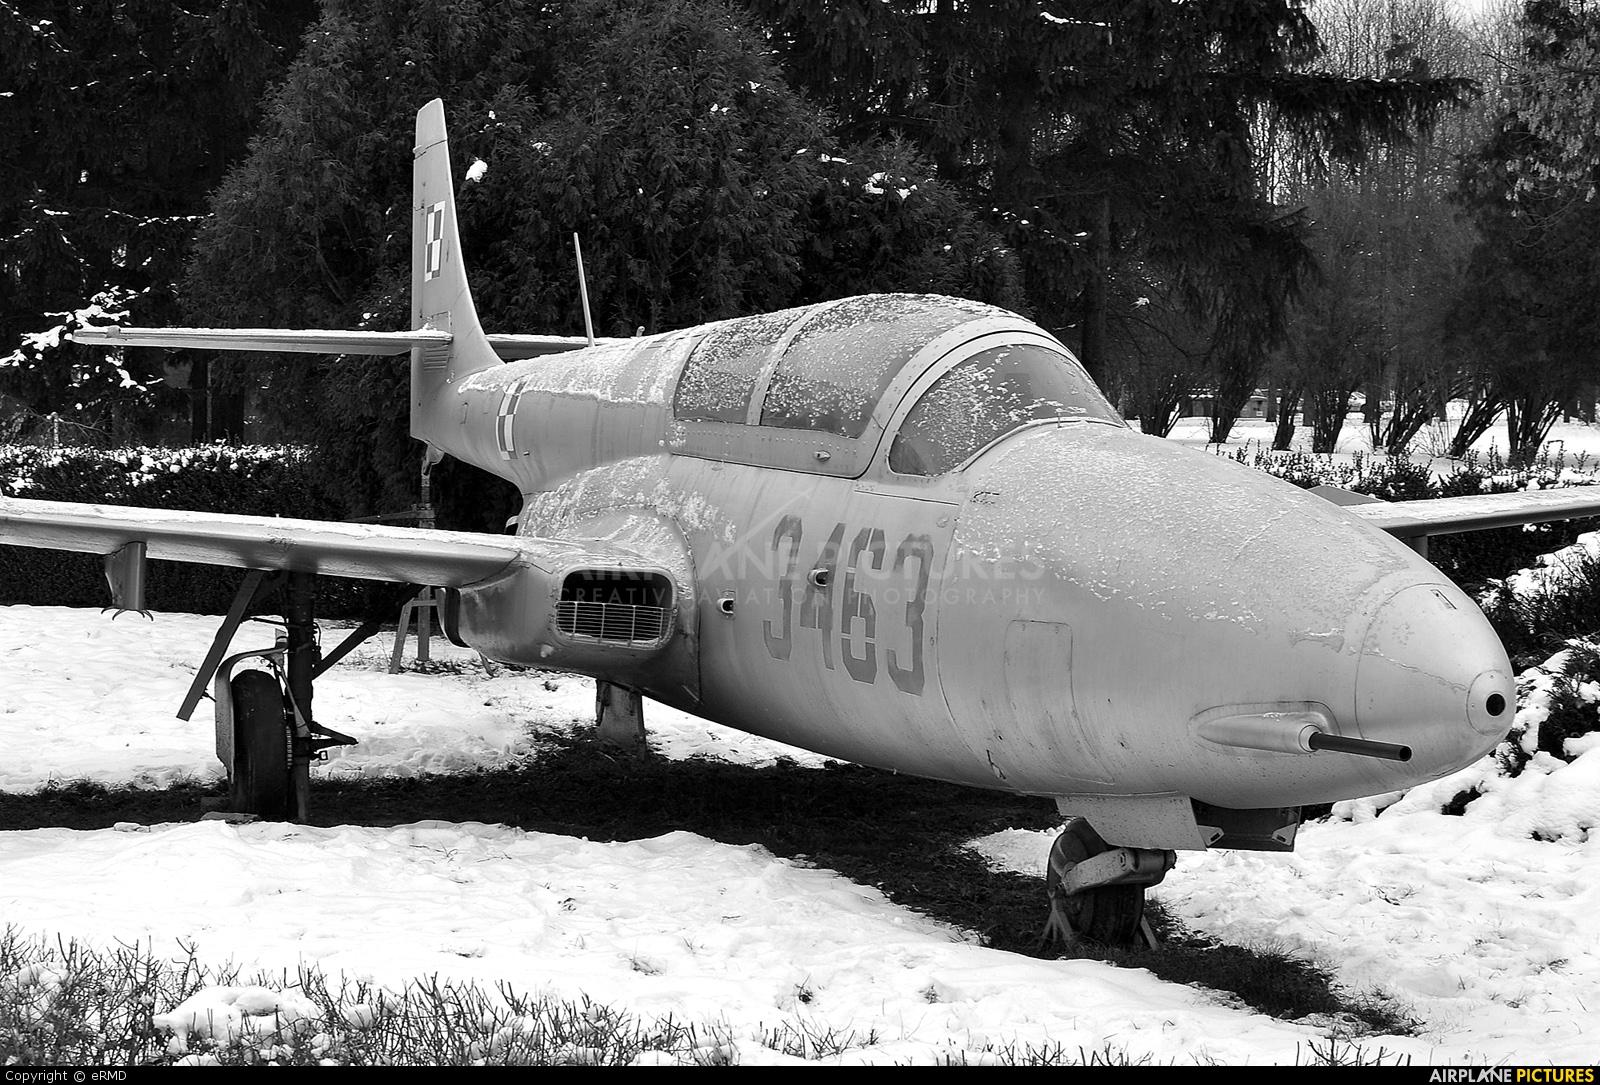 Poland - Air Force 821 aircraft at Radom - Sadków